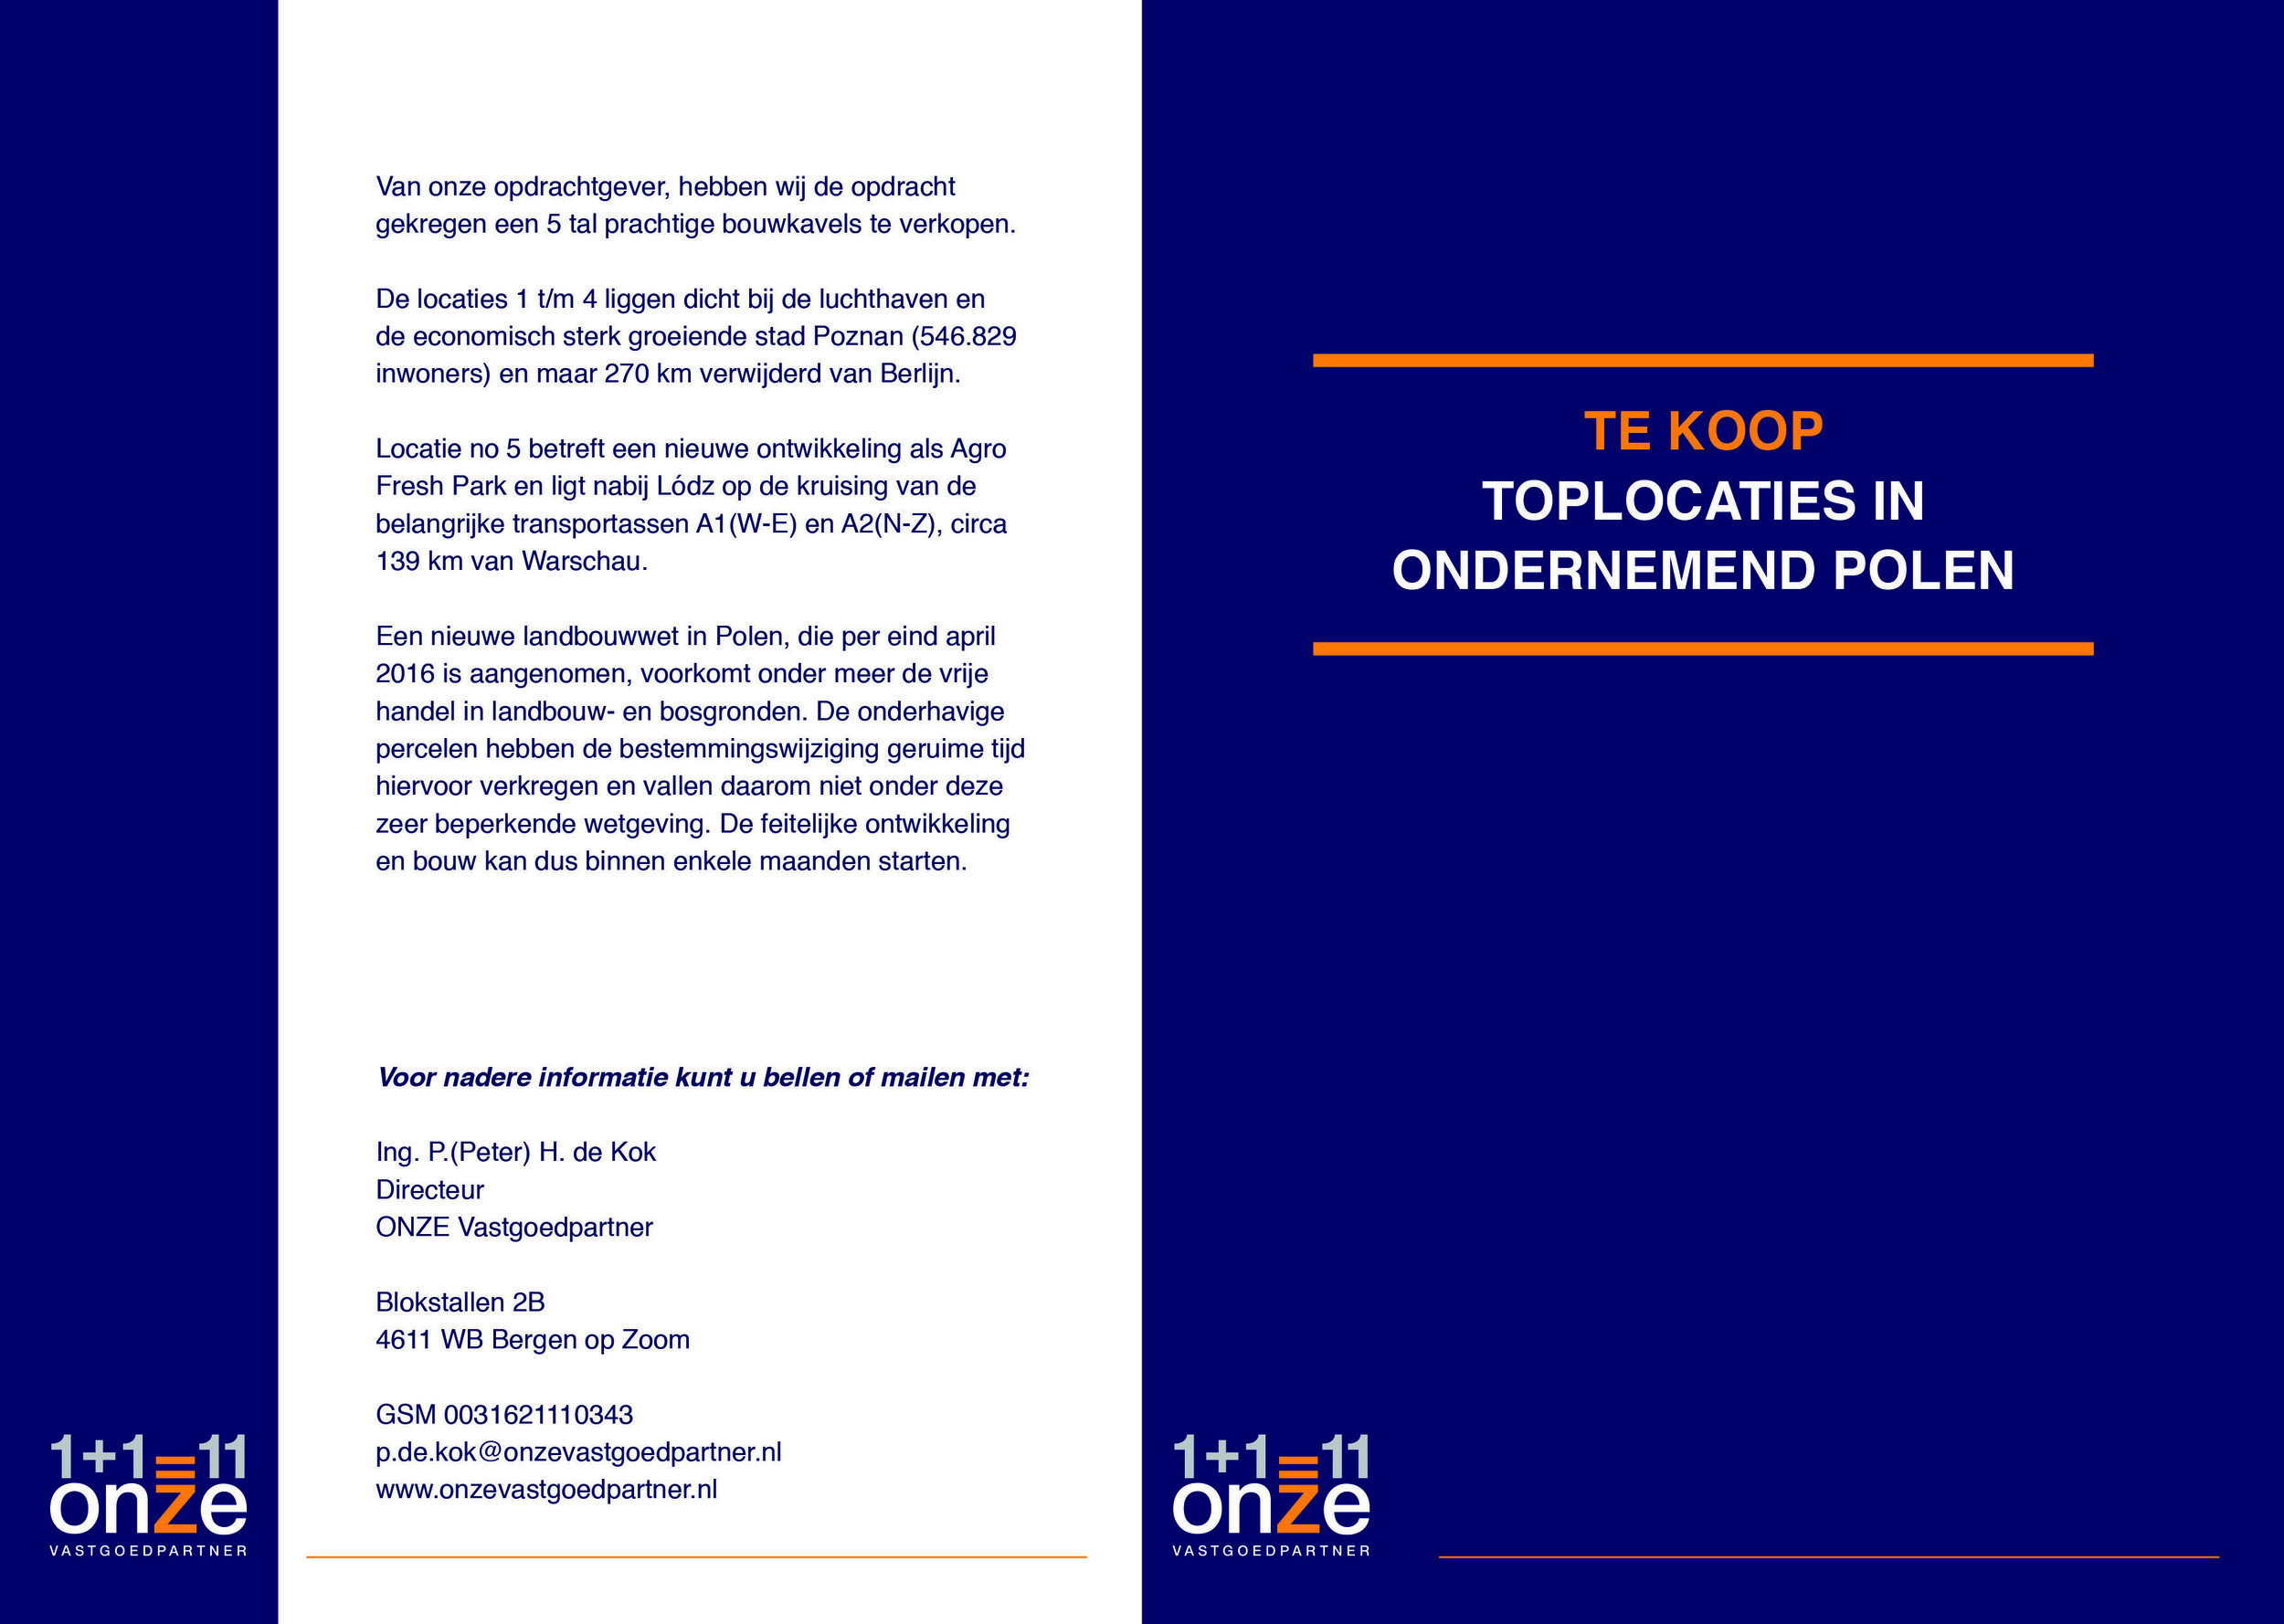 ZandBij_Onze_flyer_spread1